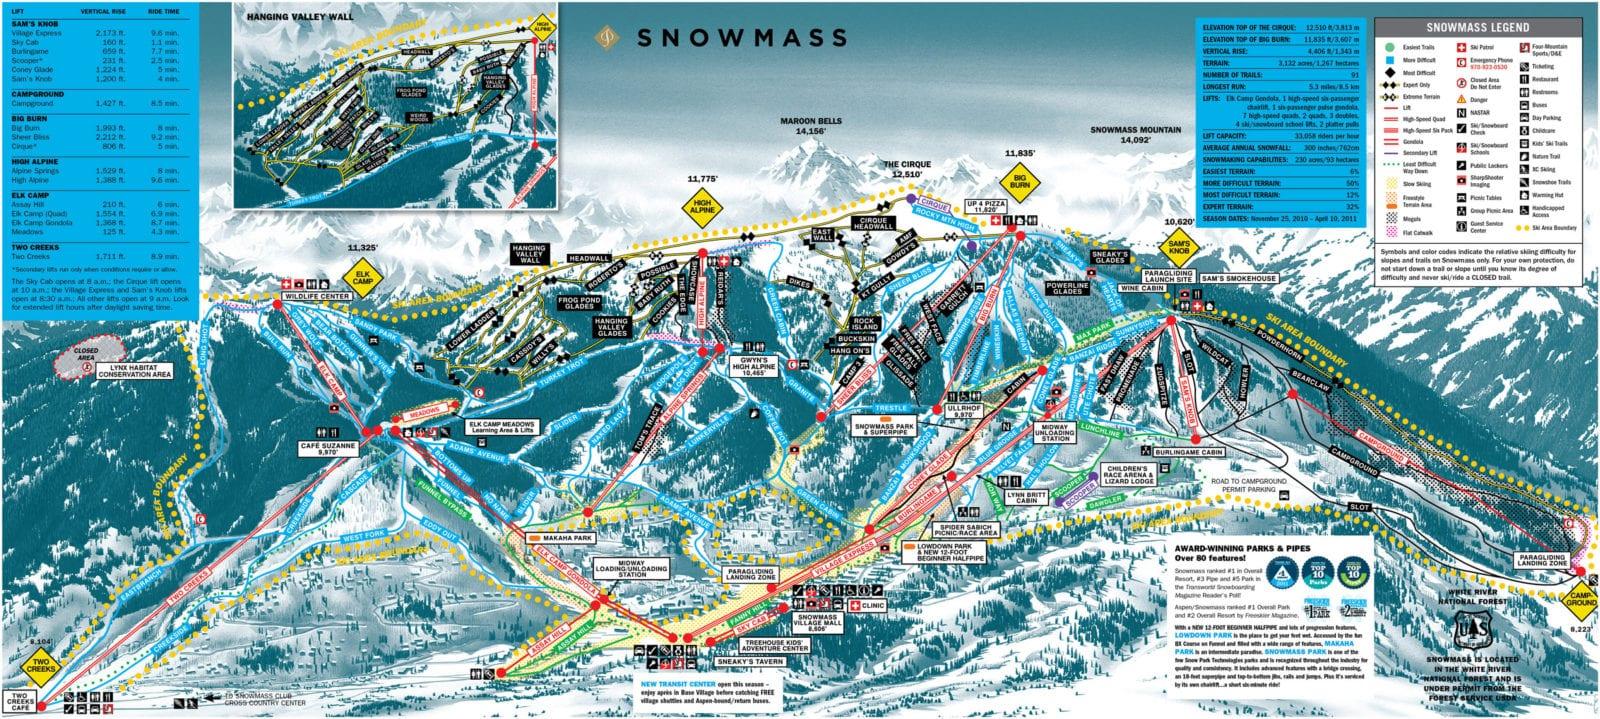 Aspen Colorado Ski Resorts Hotels